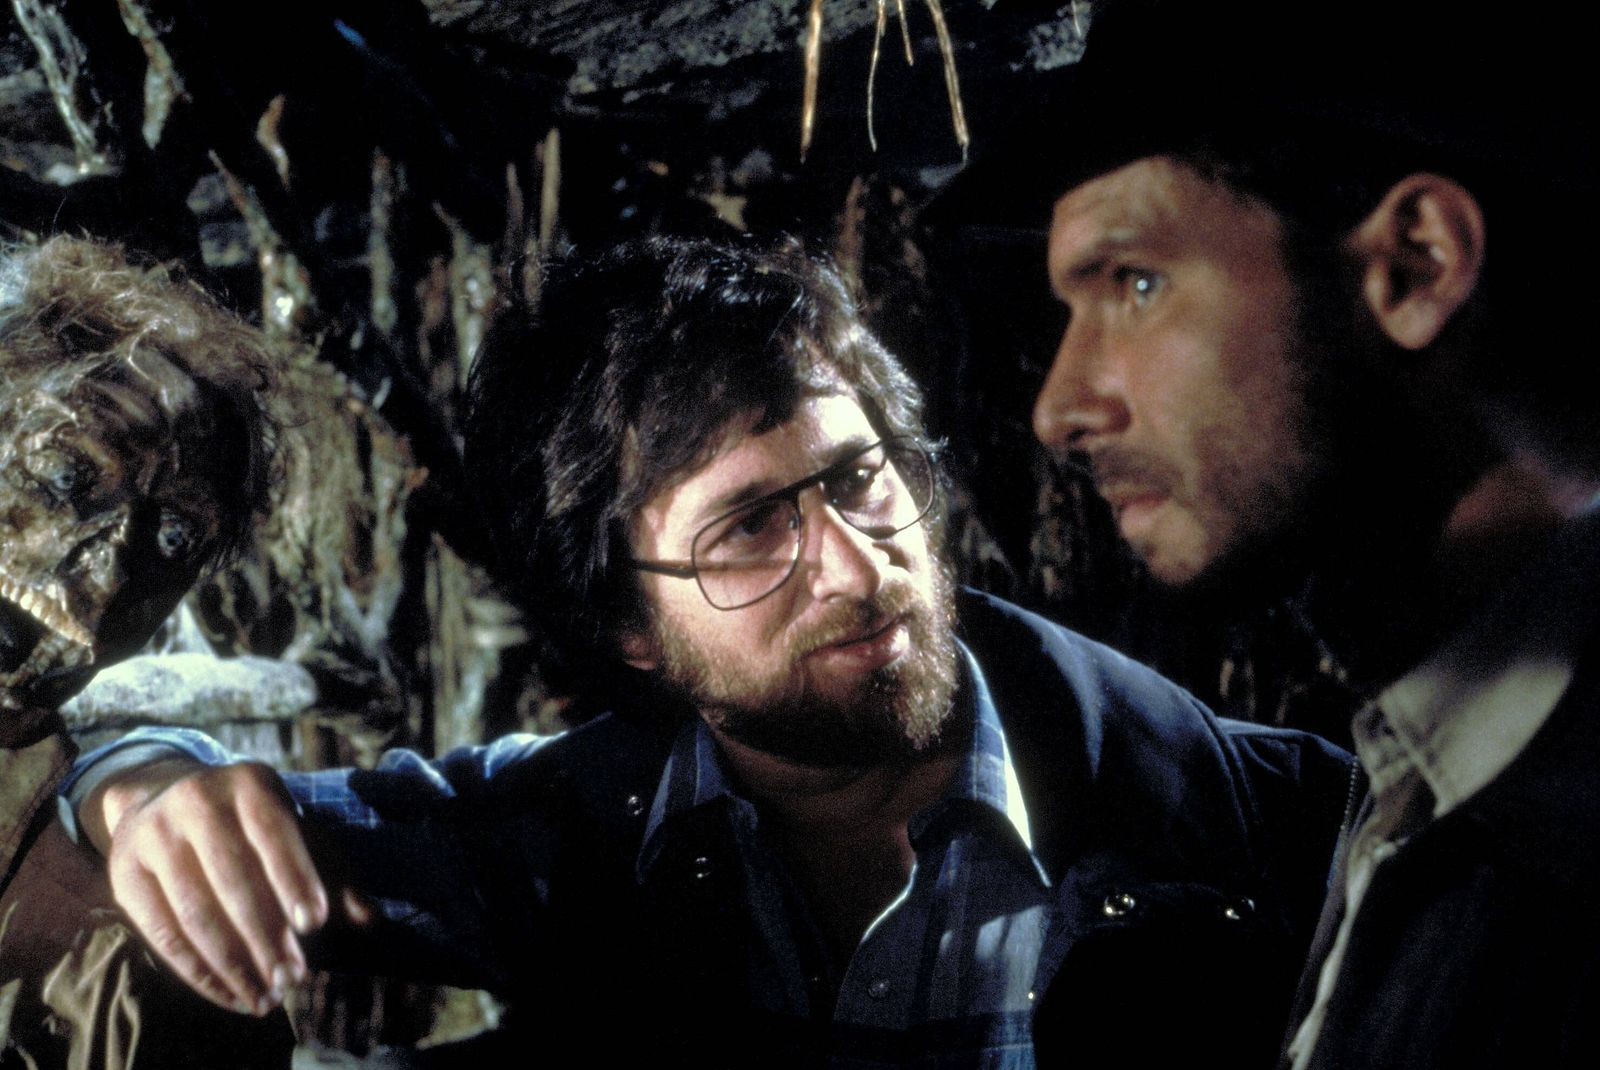 Steven Spielberg & Harrison Ford Characters: Director, Indiana Jones Film: Raiders Of The Lost Ark; Indiana Jones 1 (USA